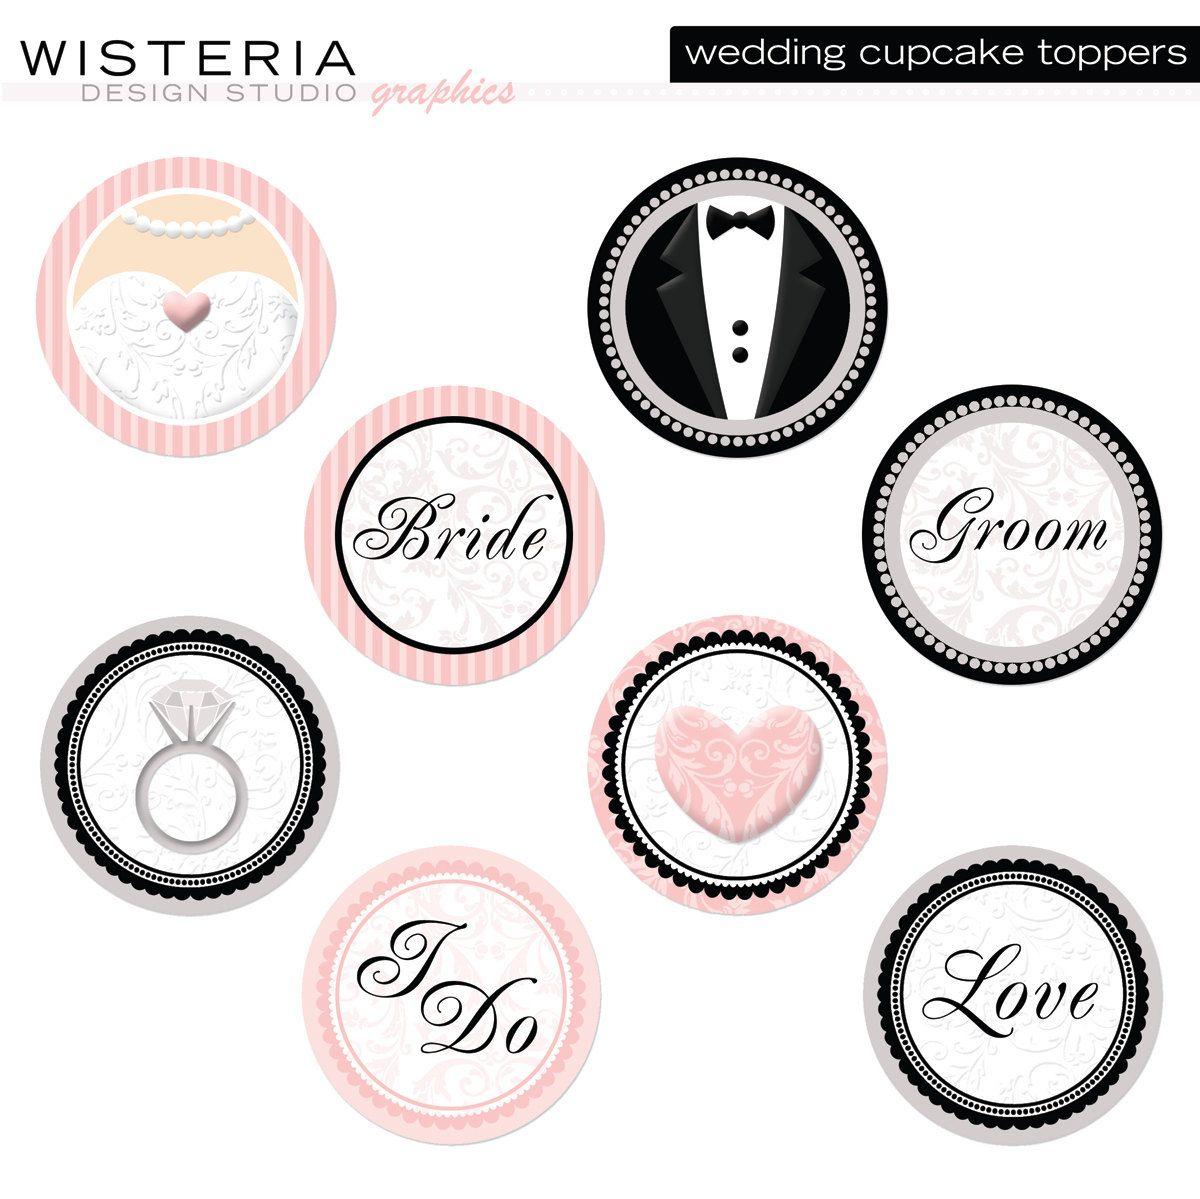 Printable cupcake toppers wedding wedding cupcake toppers diy printable cupcake toppers wedding wedding cupcake toppers diy printables by wisteriadesignstudio junglespirit Choice Image